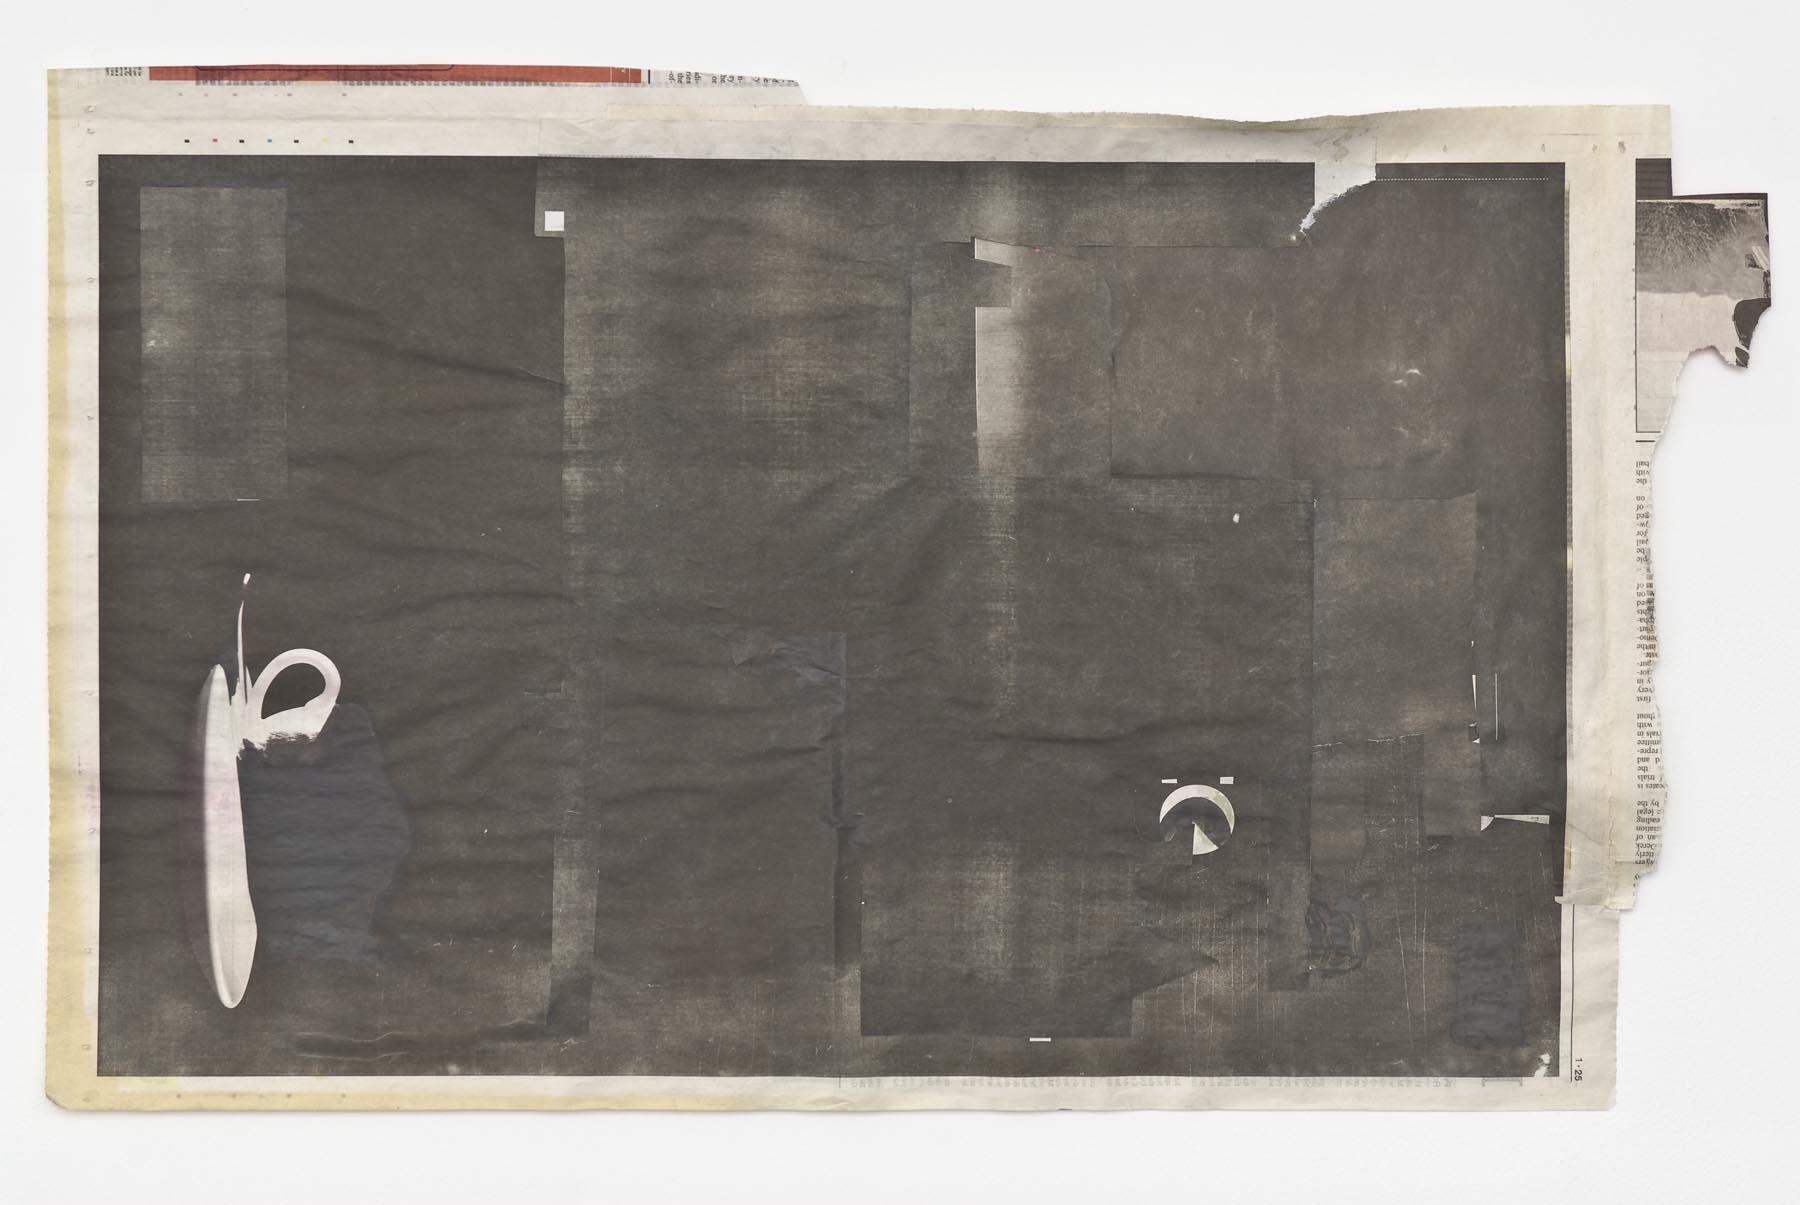 Slang is Signals 2007 acrylic on newsprint 38.1 x 63 cm